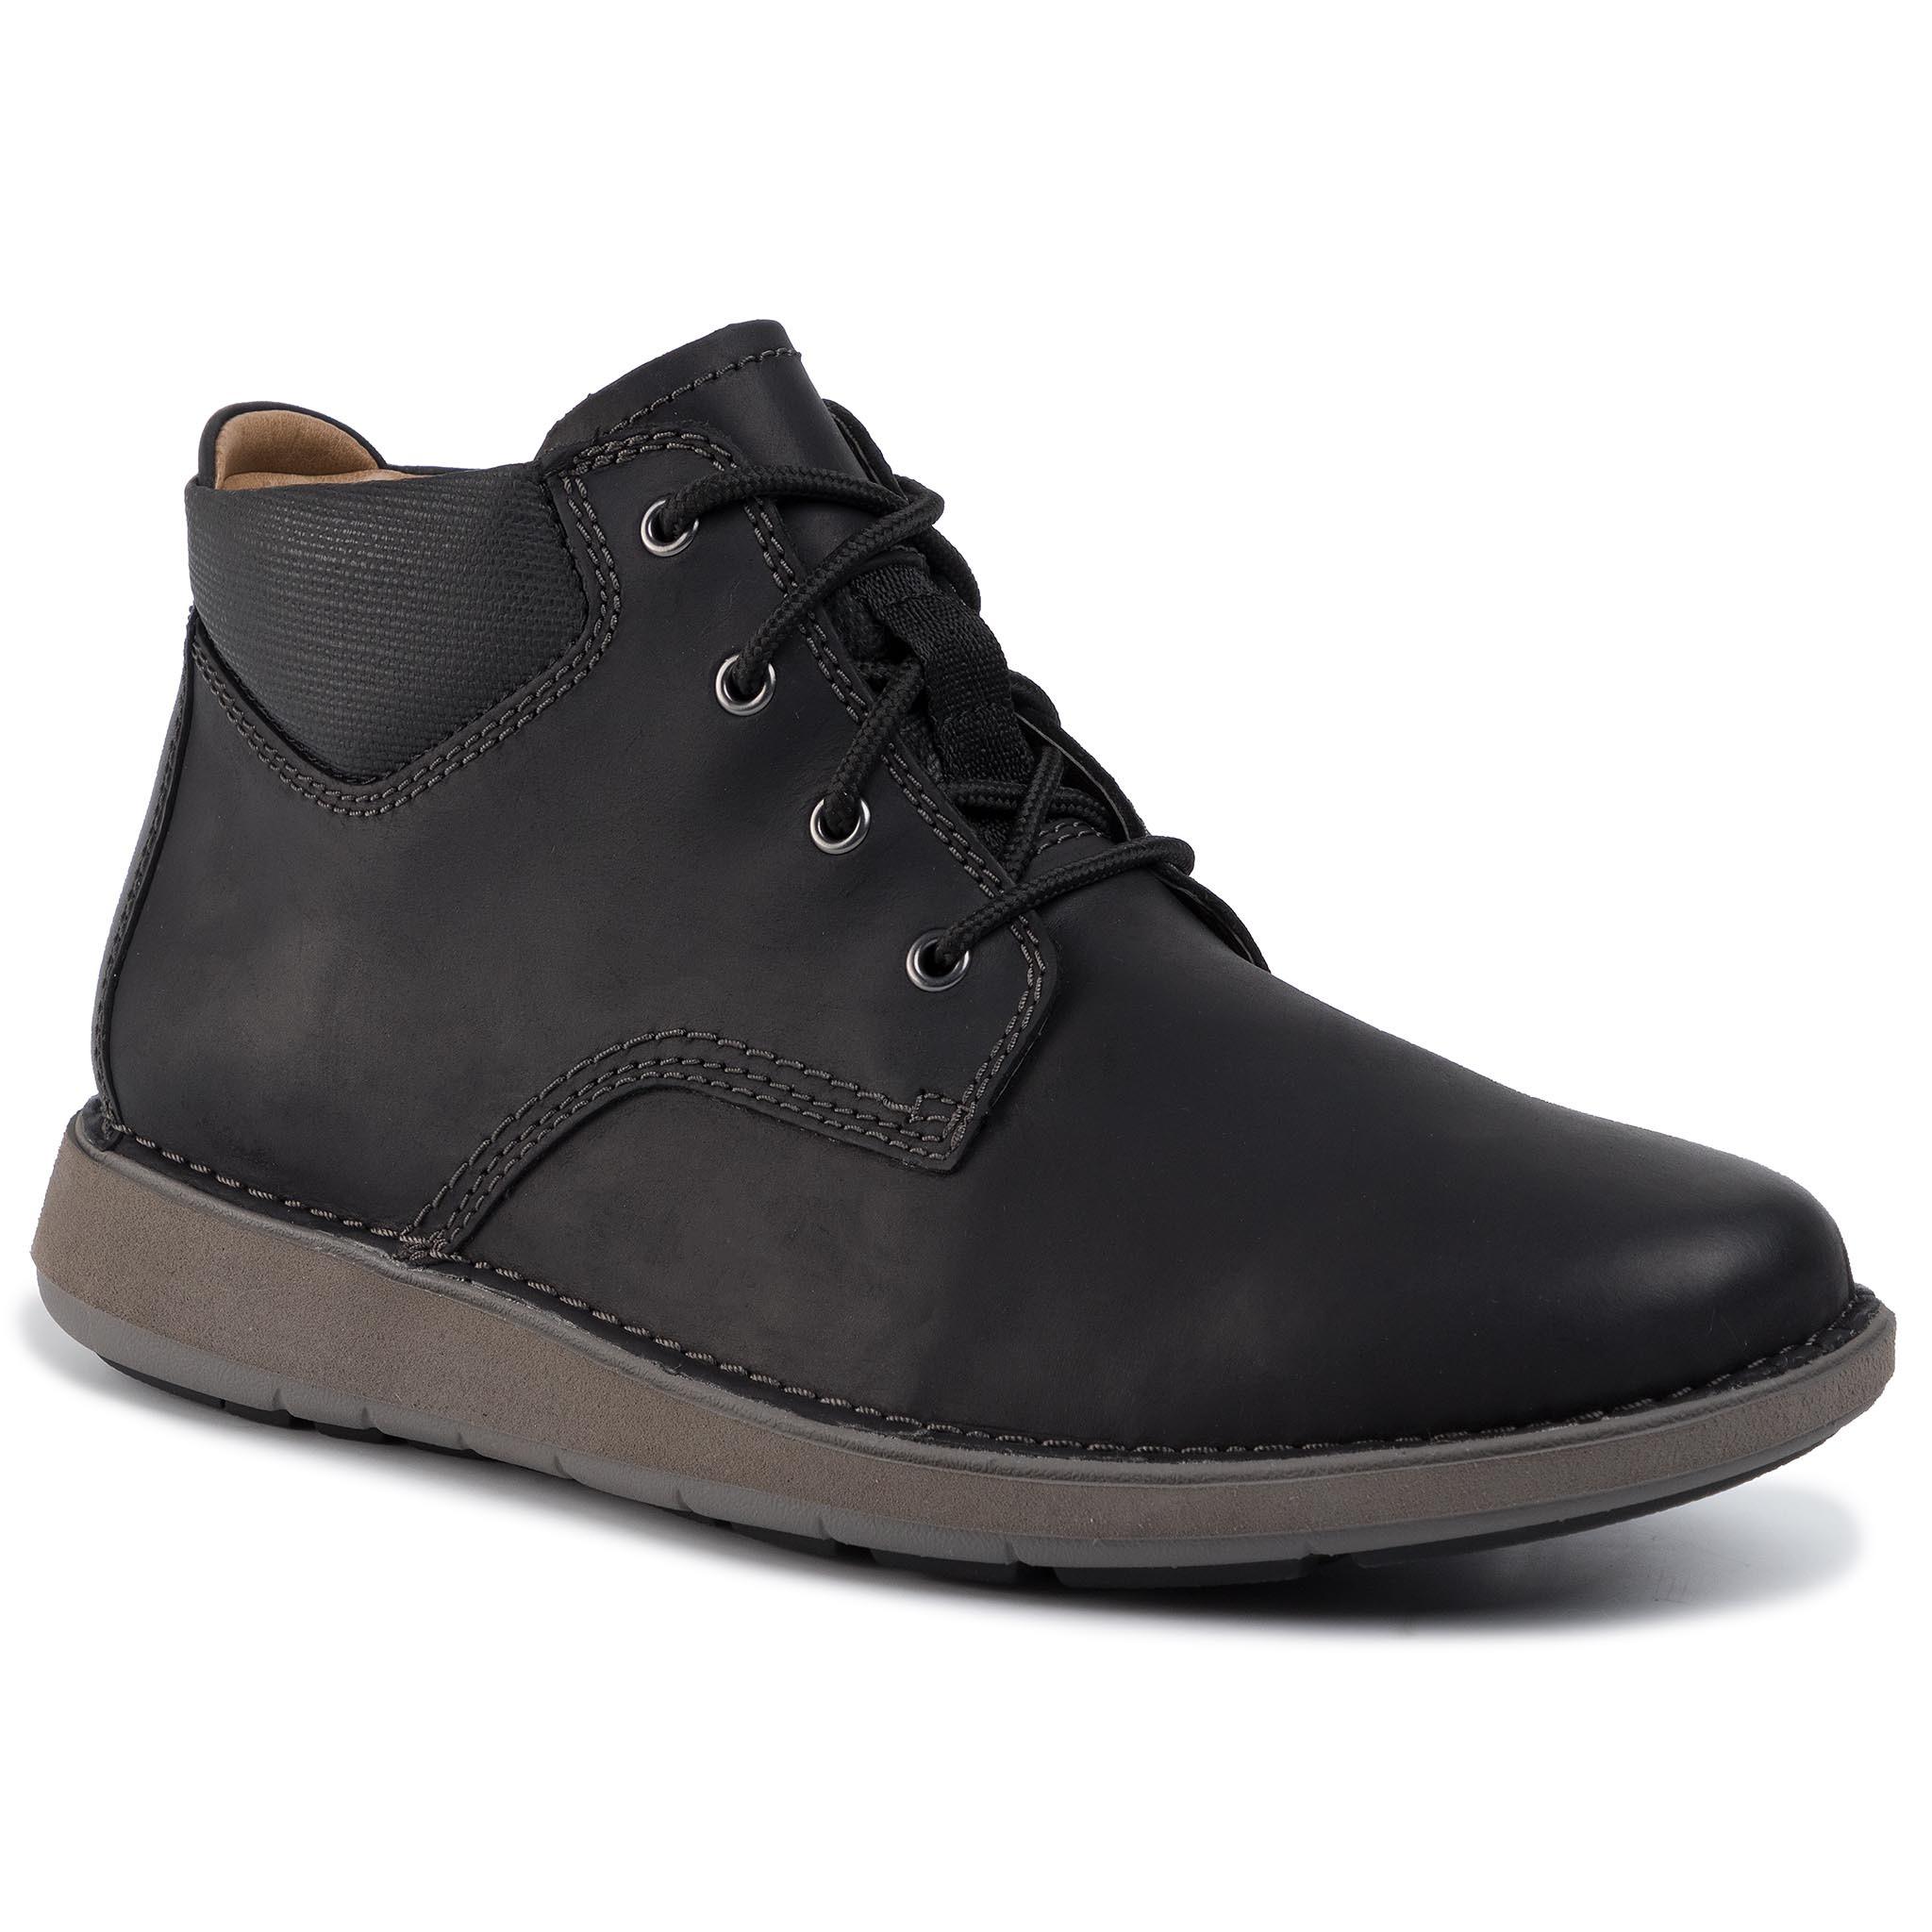 Ghete CLARKS - Un Larvik Top 261446037 Black Leather